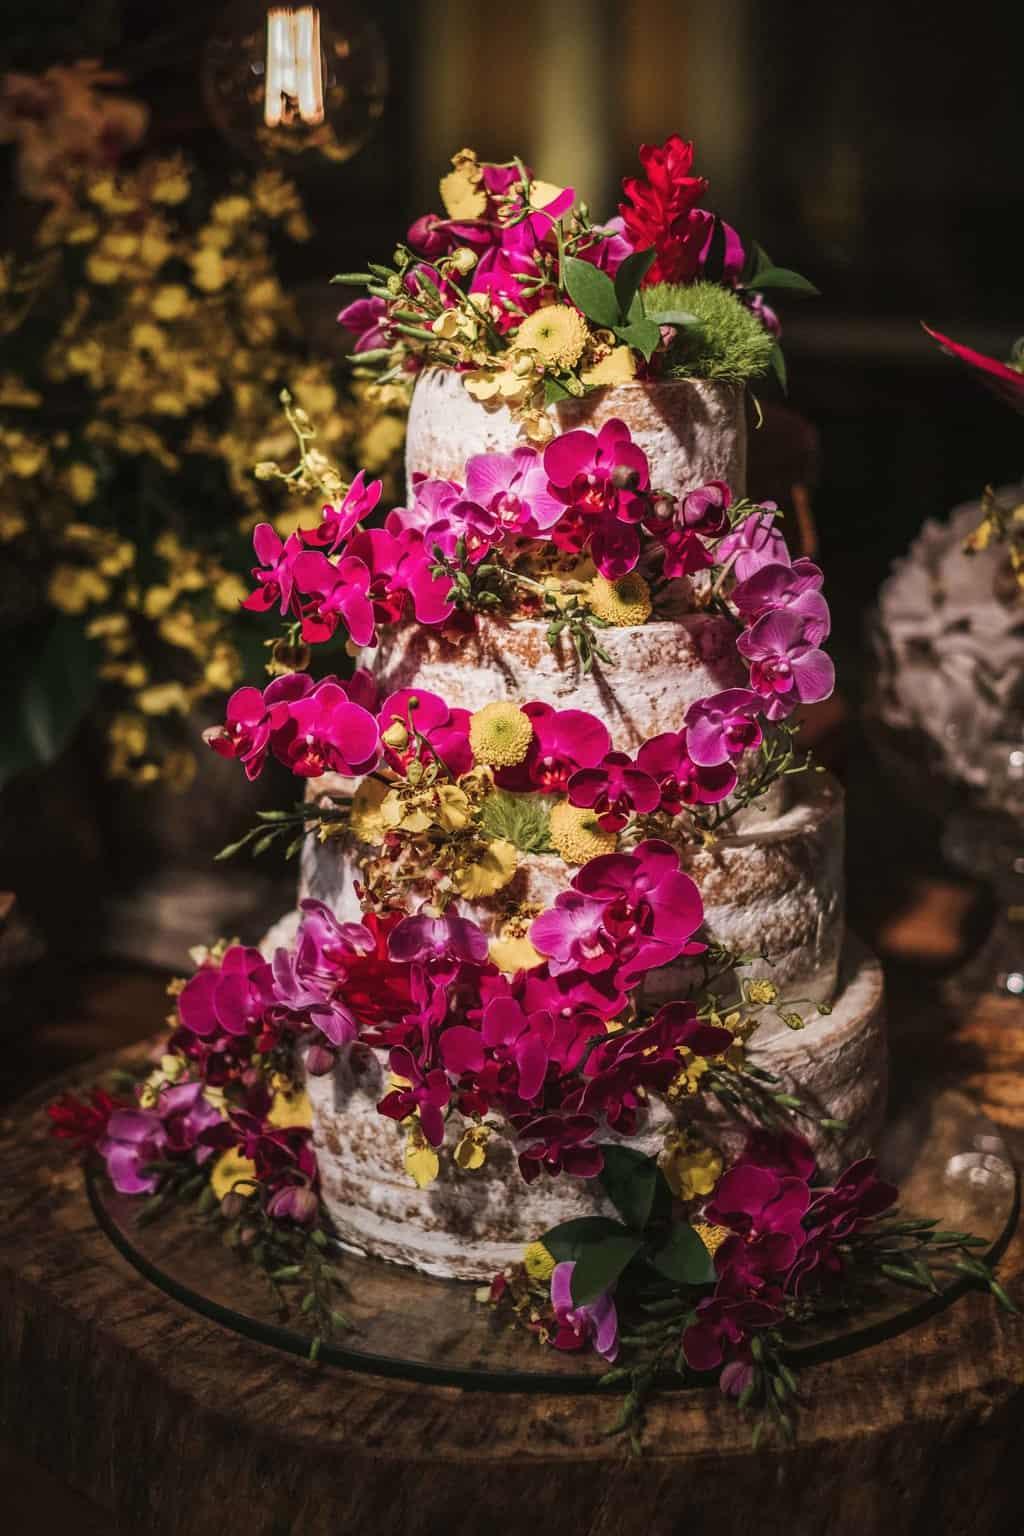 bolo-de-casamento-casamento-na-serra-Fotografia-Renata-Xavier-Les-Amies-Cerimonial-Locanda-Della-Mimosa-mesa-de-doces-Natalia-e-Bruno514